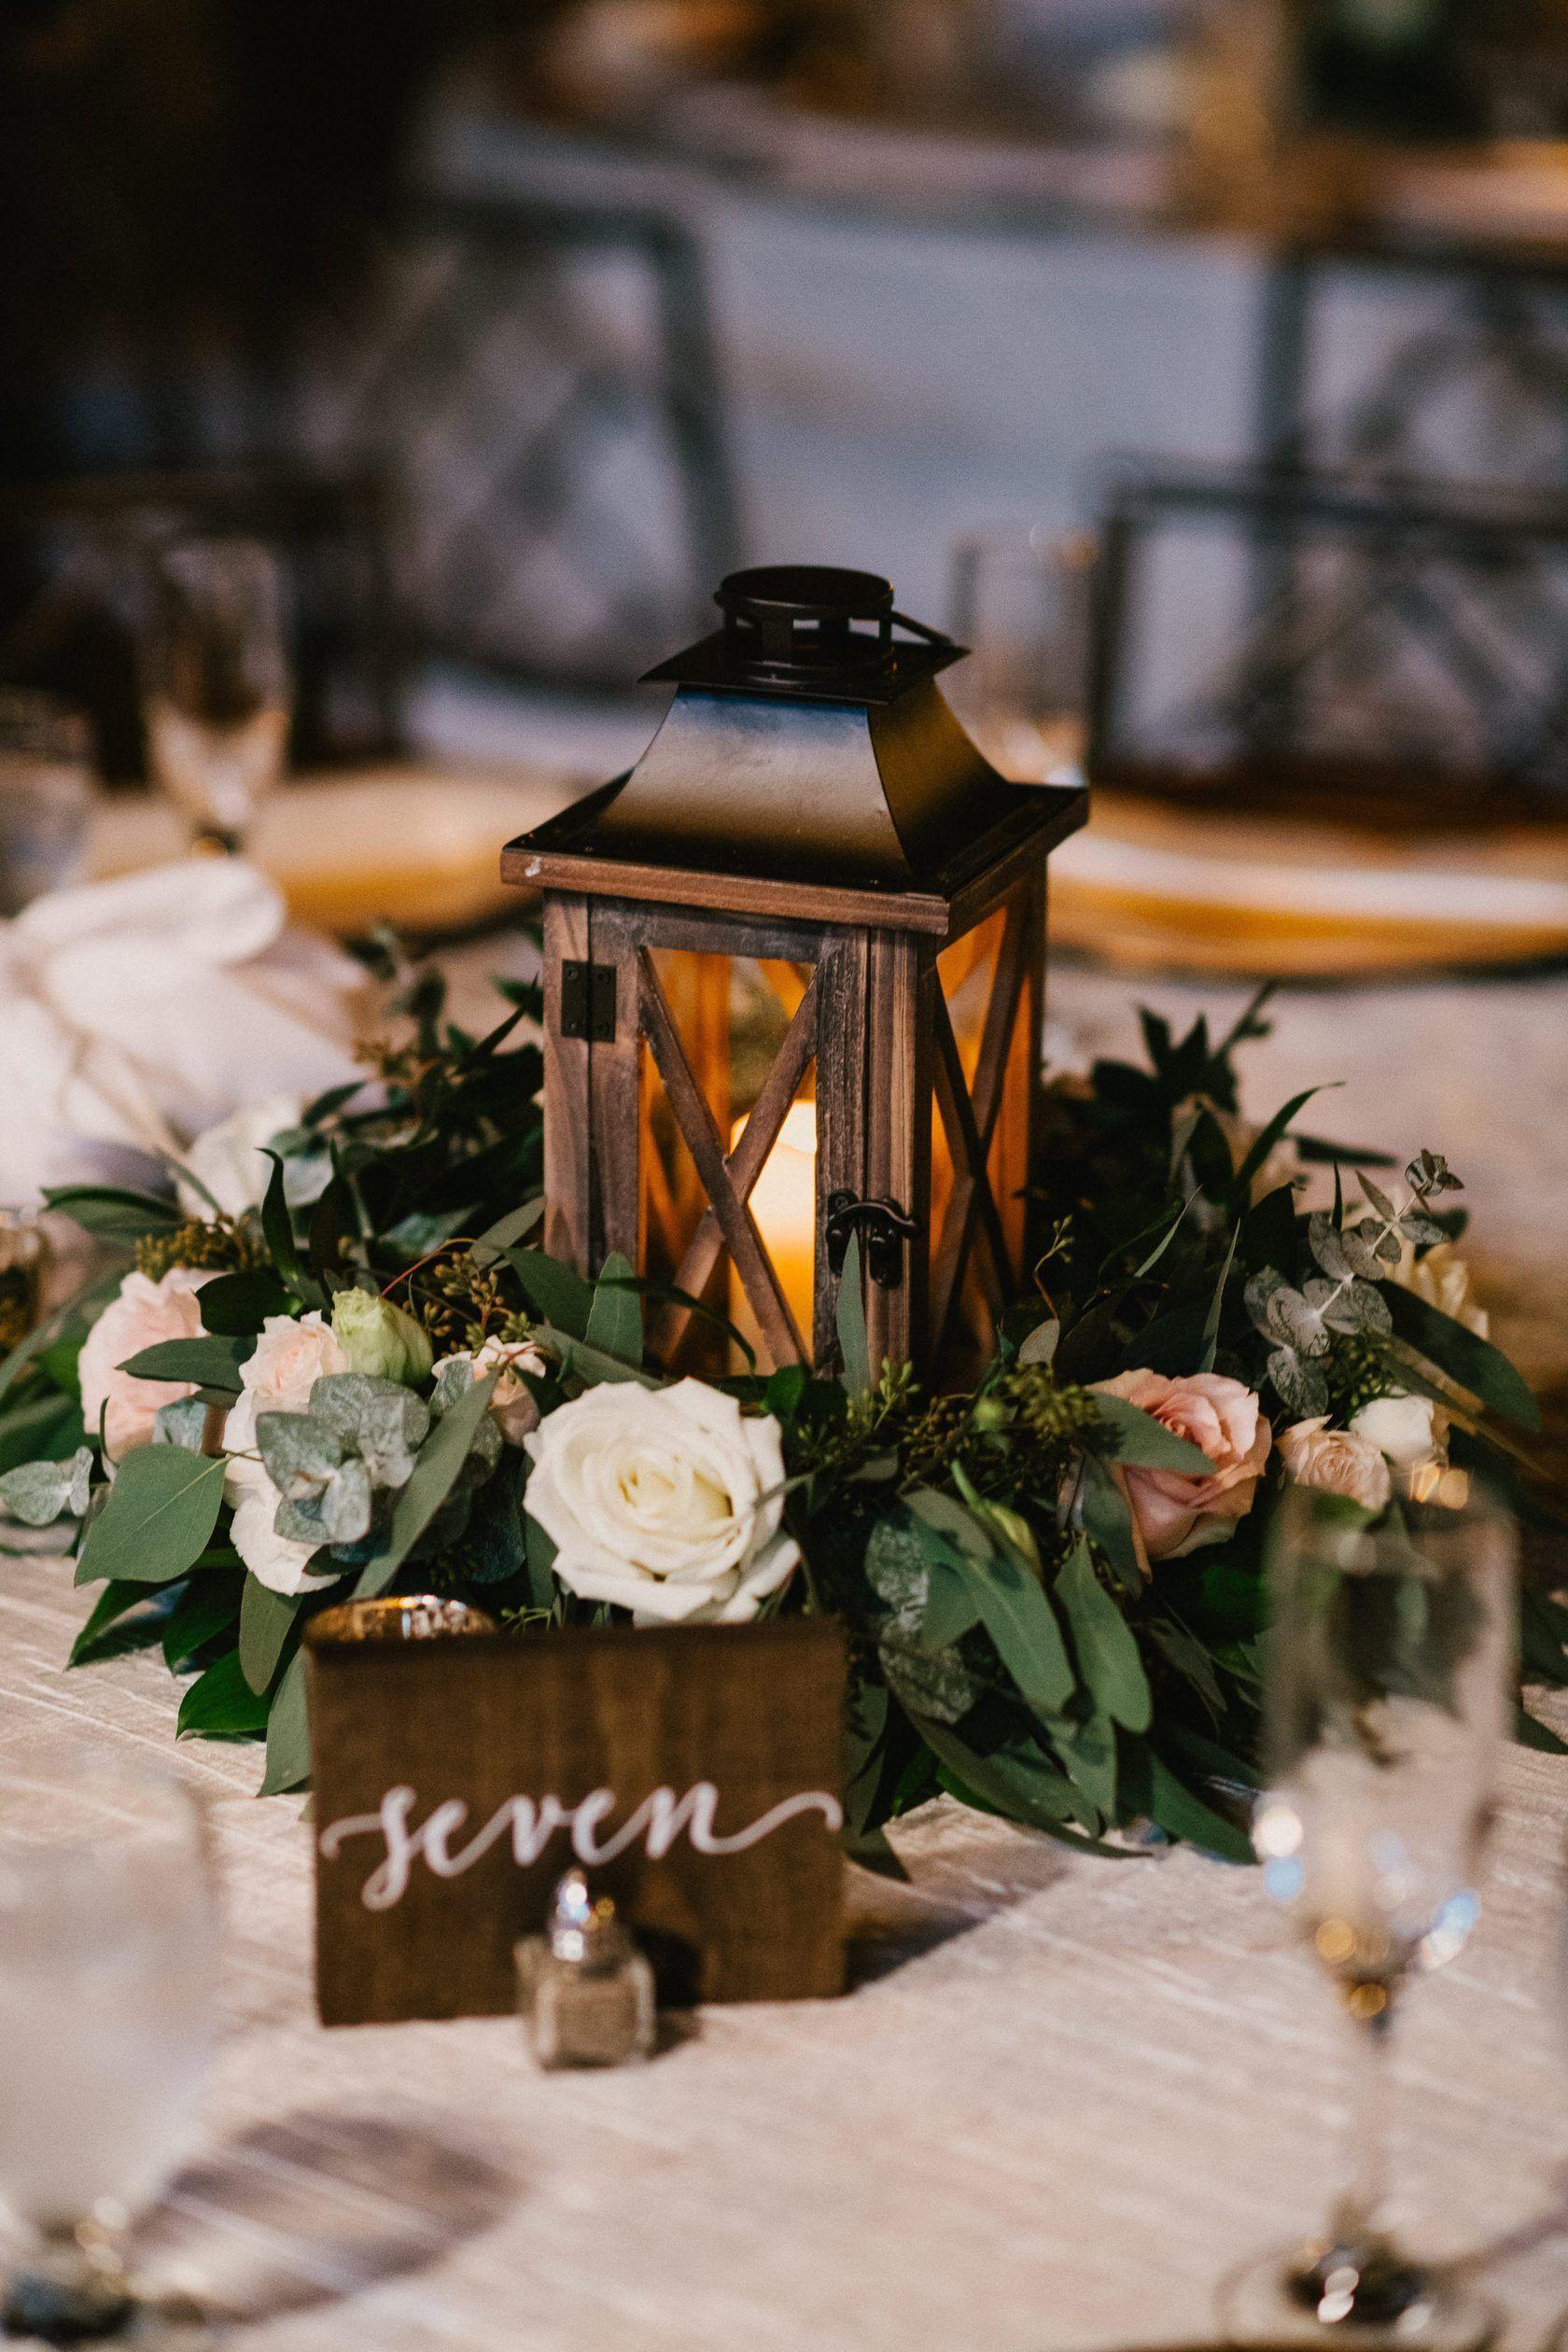 20 Greenery Filled Winter Wedding Ideas to Inspire – Elegantweddinginvites.com Blog